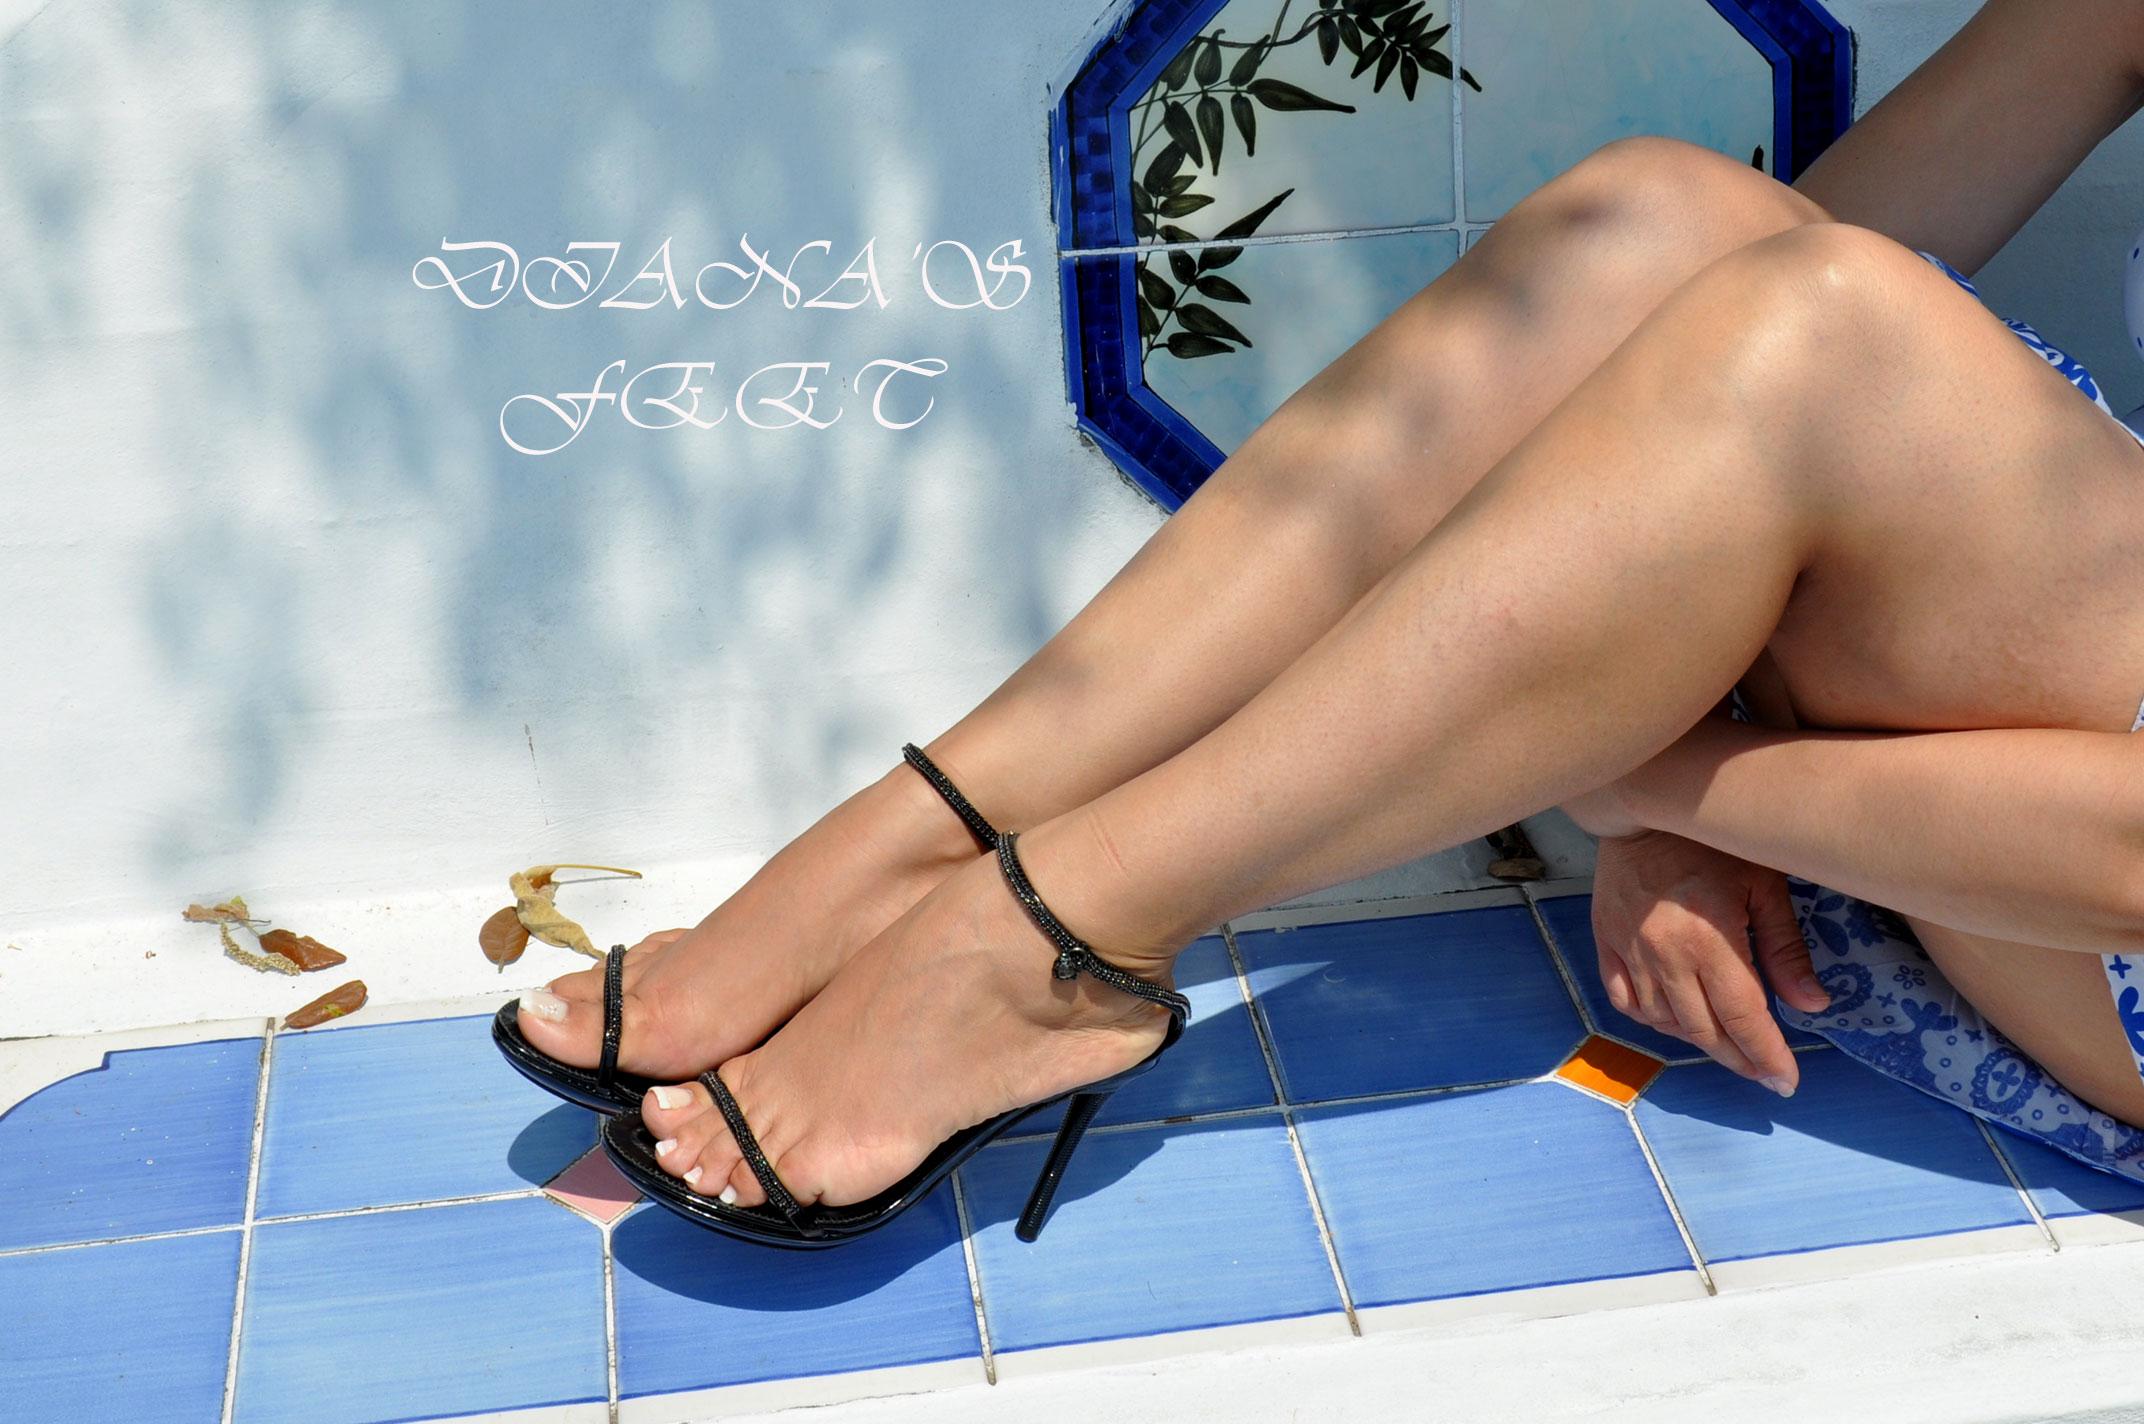 Diana 's feet 0f201310